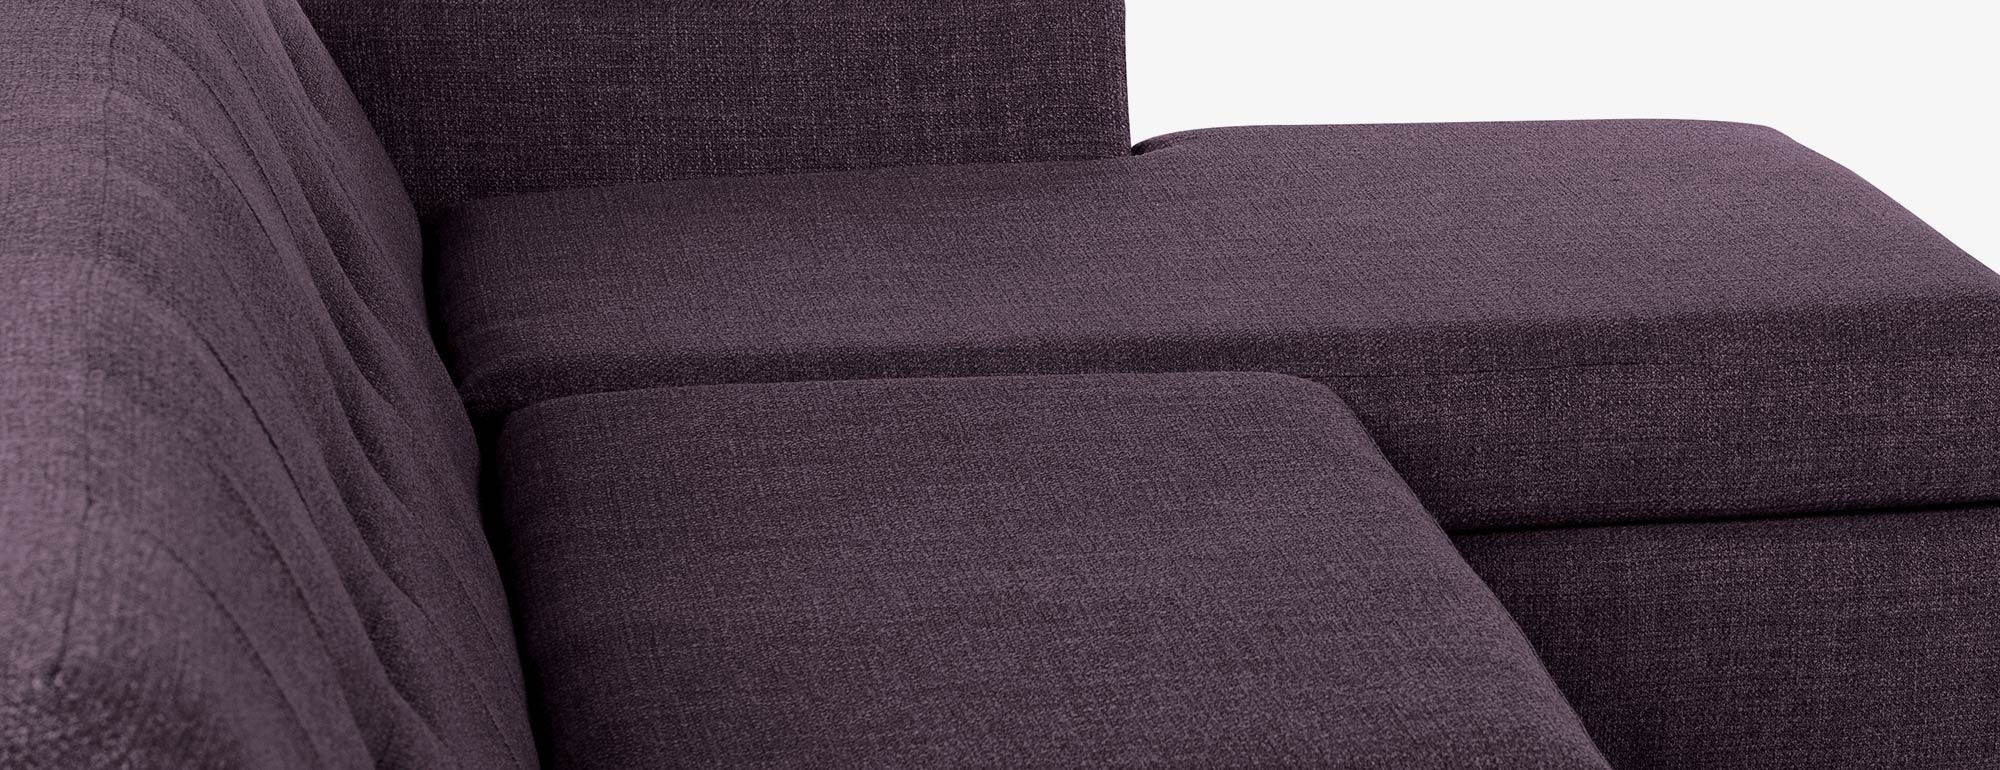 shown in Key Largo Grape Fabric